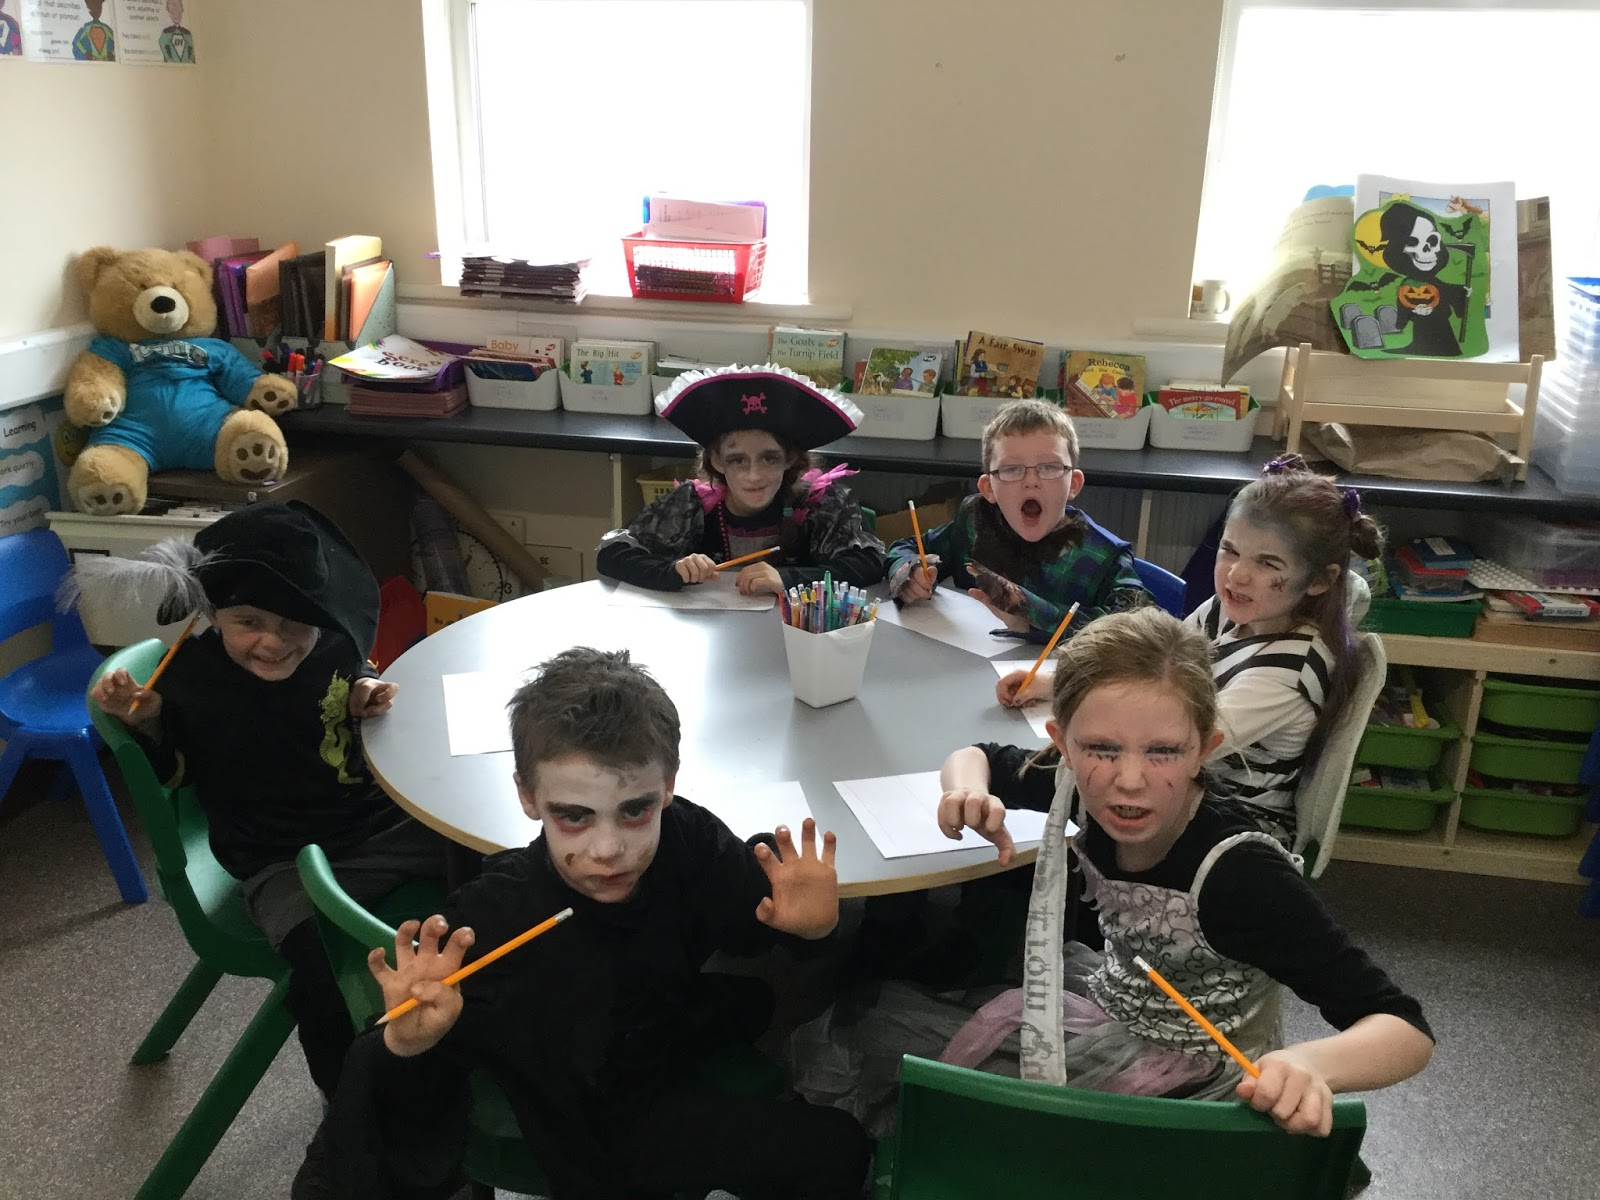 Burncourt National School: Horror Stories in First Class!